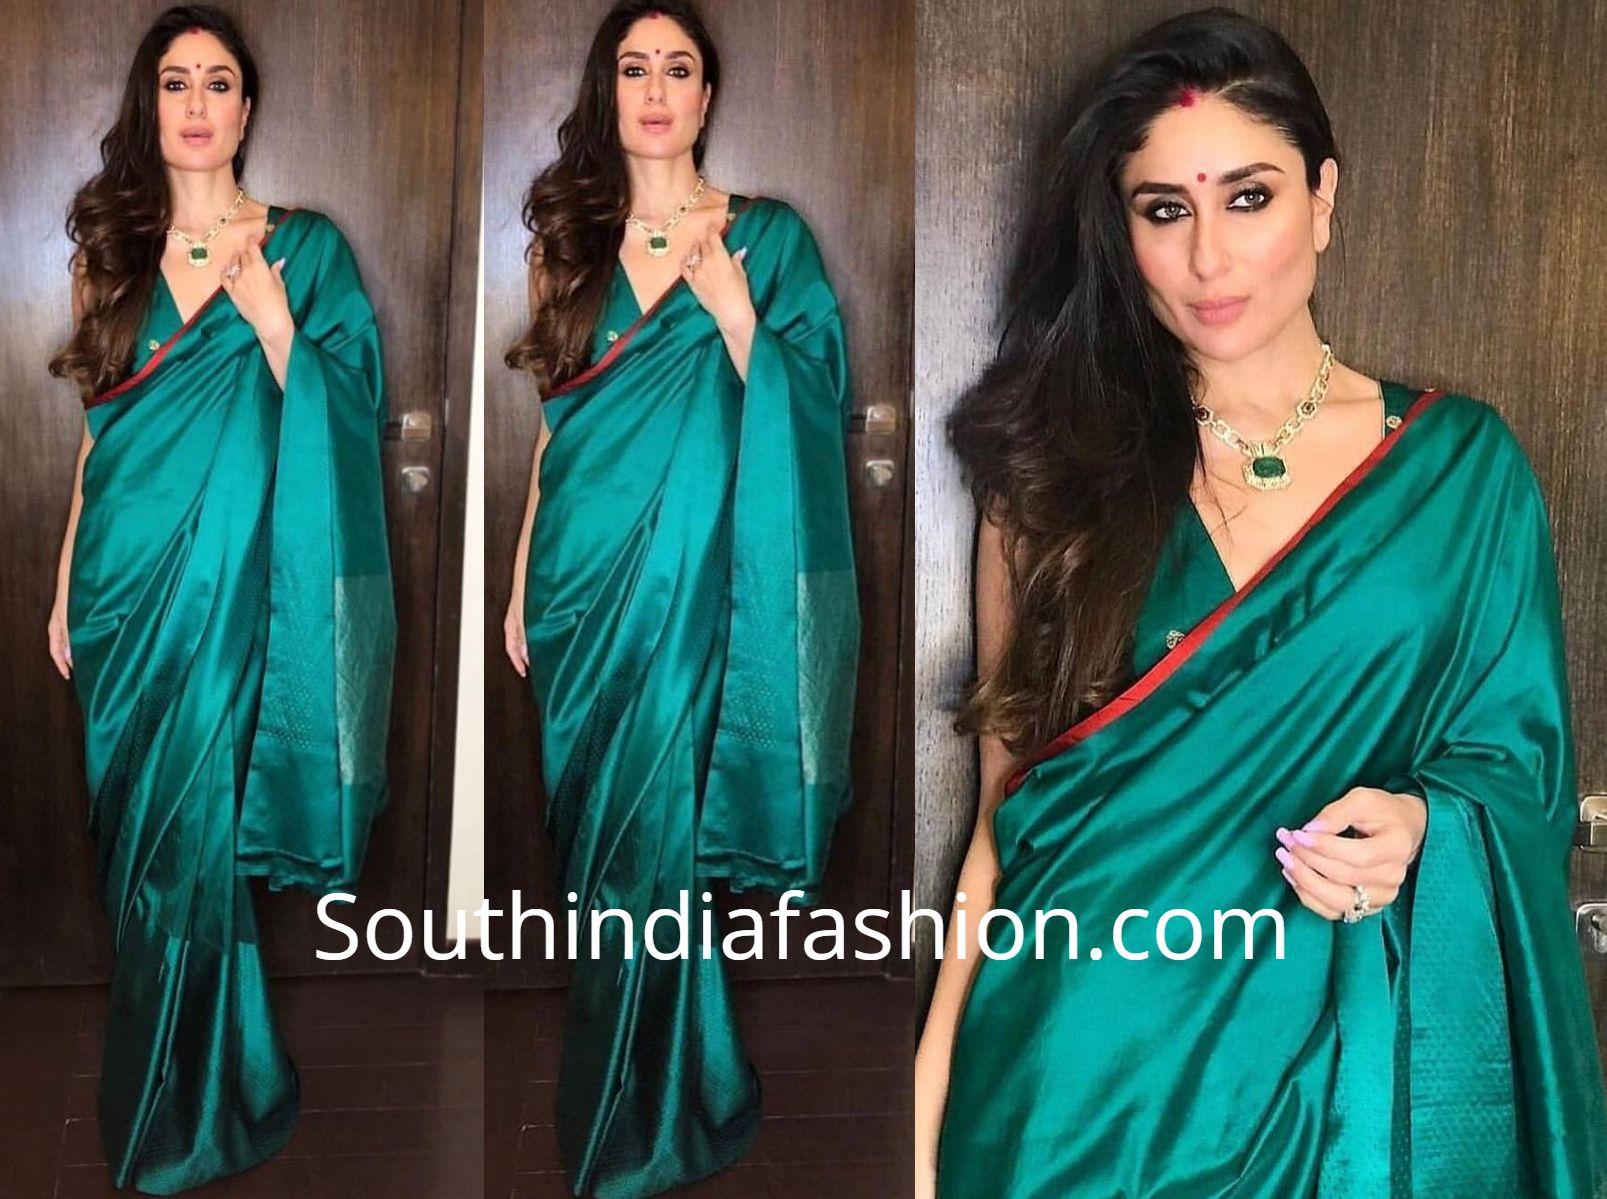 Kareena Kapoor S Festive Look South India Fashion Kareena Kapoor Saree Saree Look Green Saree